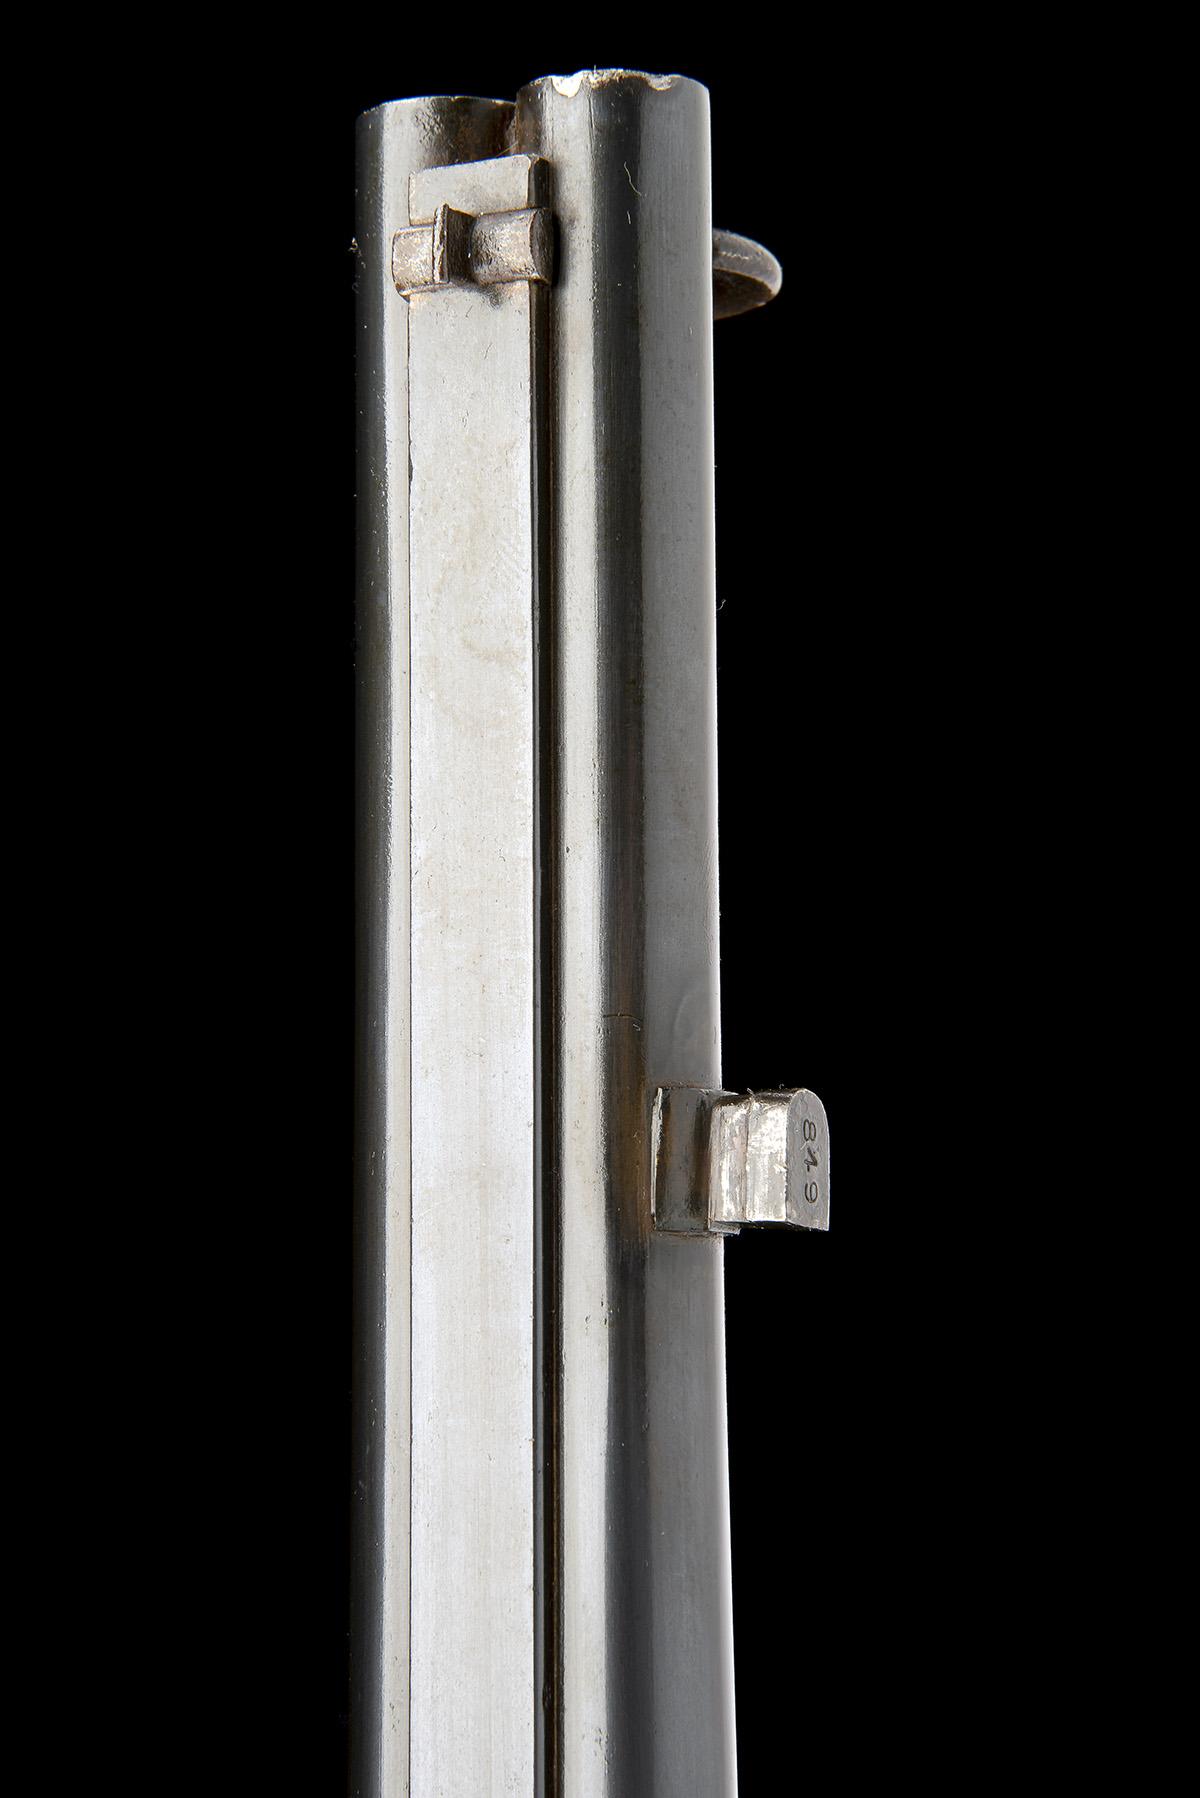 SWINBURN & SON, BIRMINGHAM A .524 PERCUSSION DOUBLE-BARRELLED SERVICE RIFLE, MODEL 'JACOB'S - Image 9 of 9